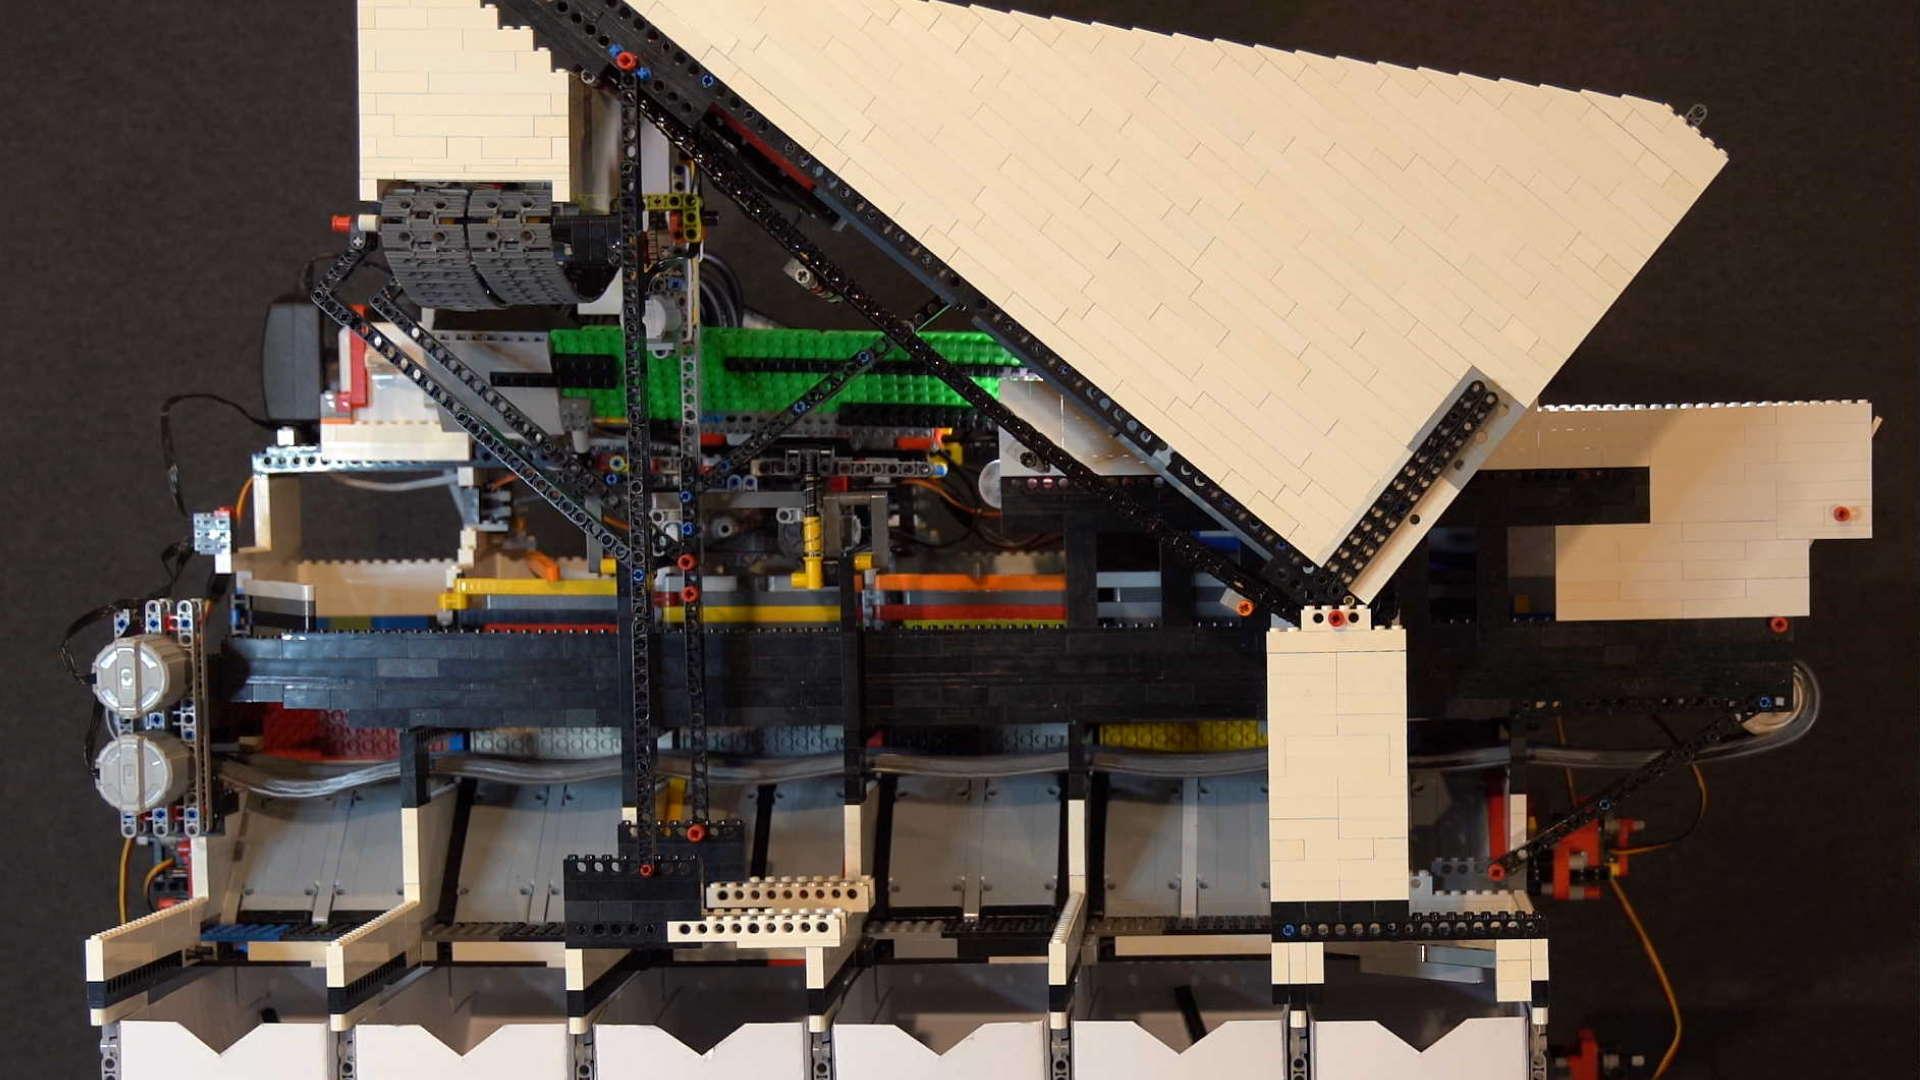 Daniel Wests Raspberry Pi powered AI Lego sorting machine